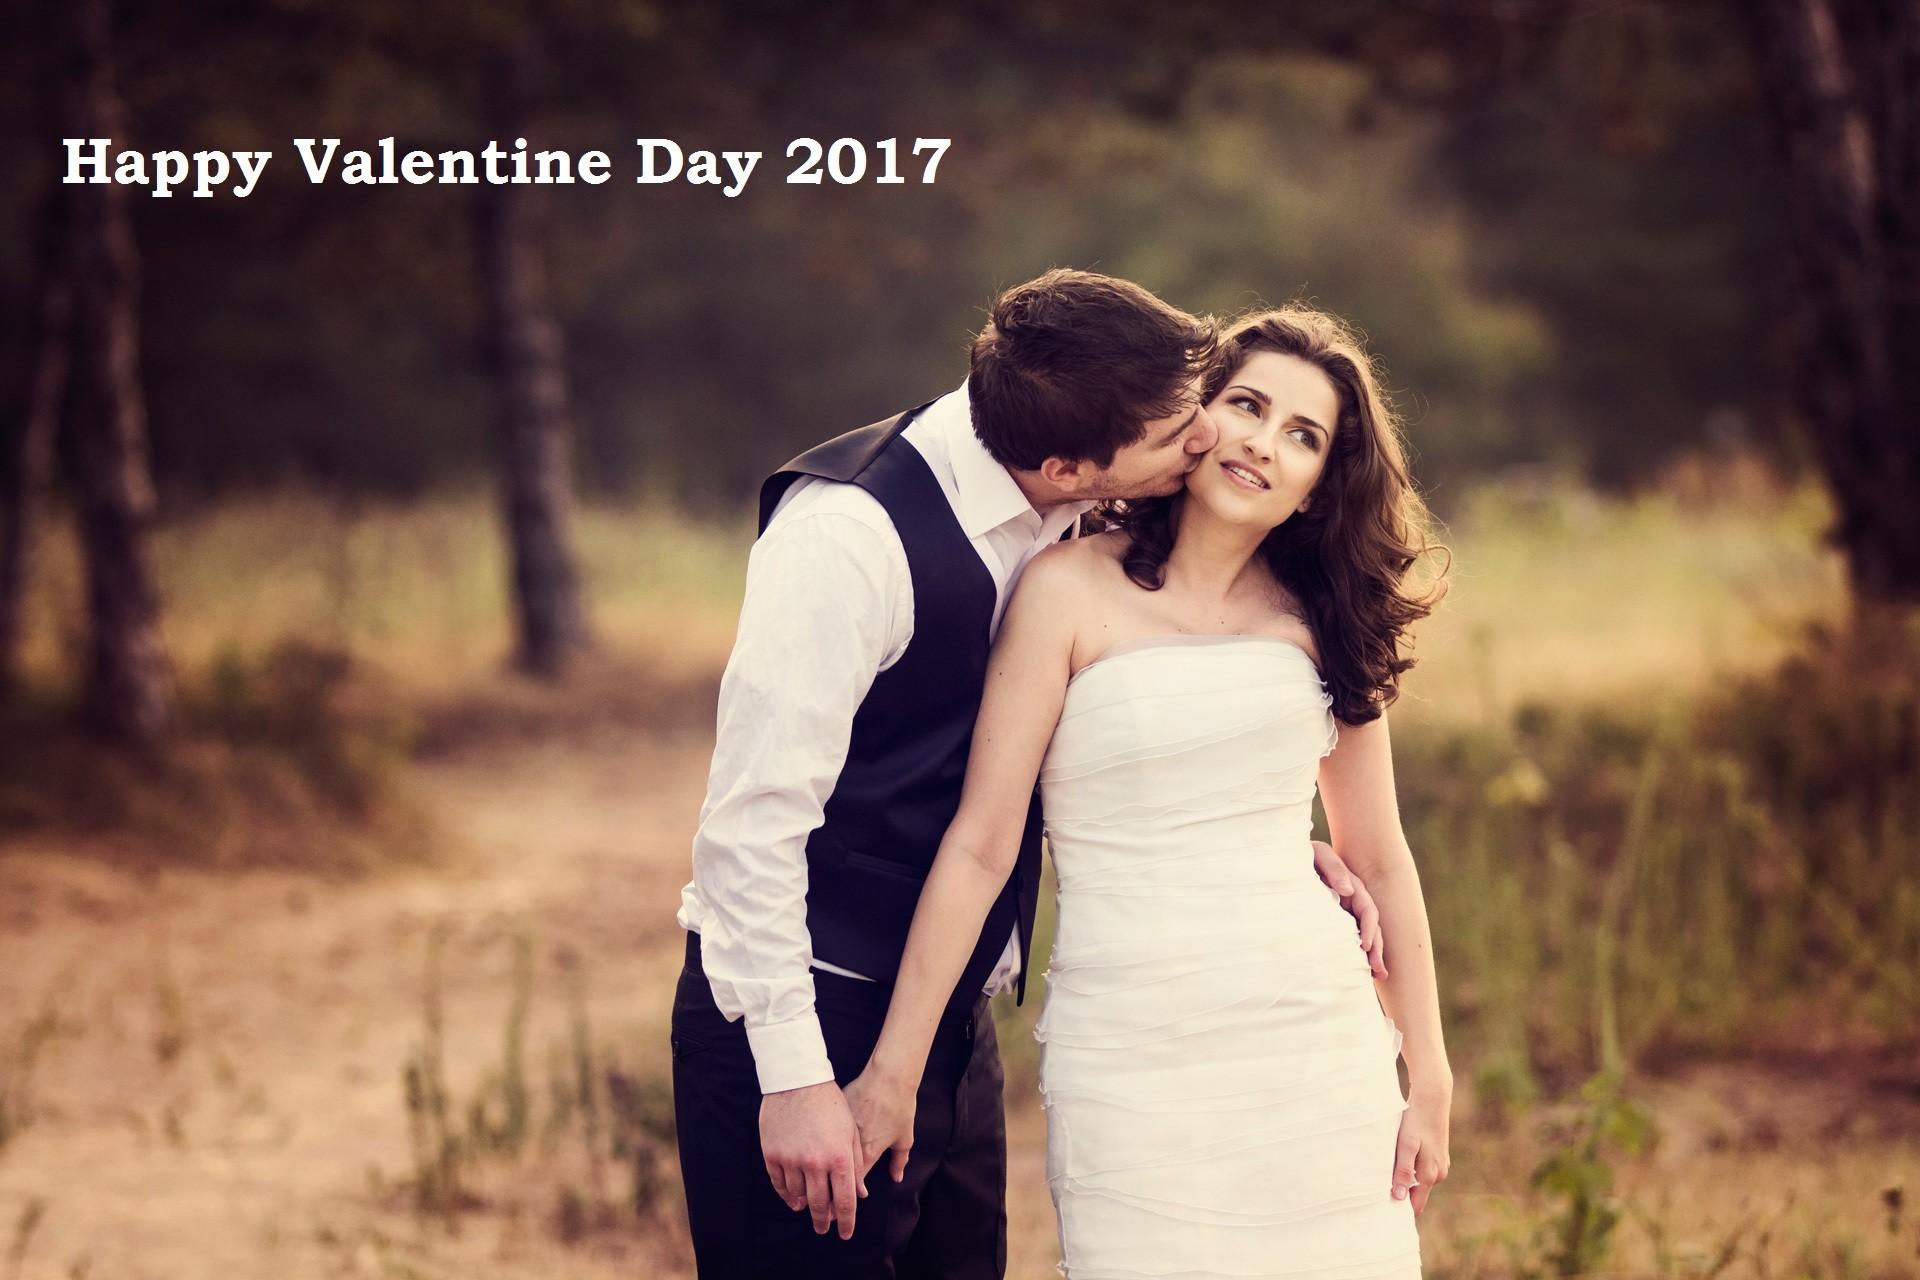 Kissing Wallpapers HD 2017 1